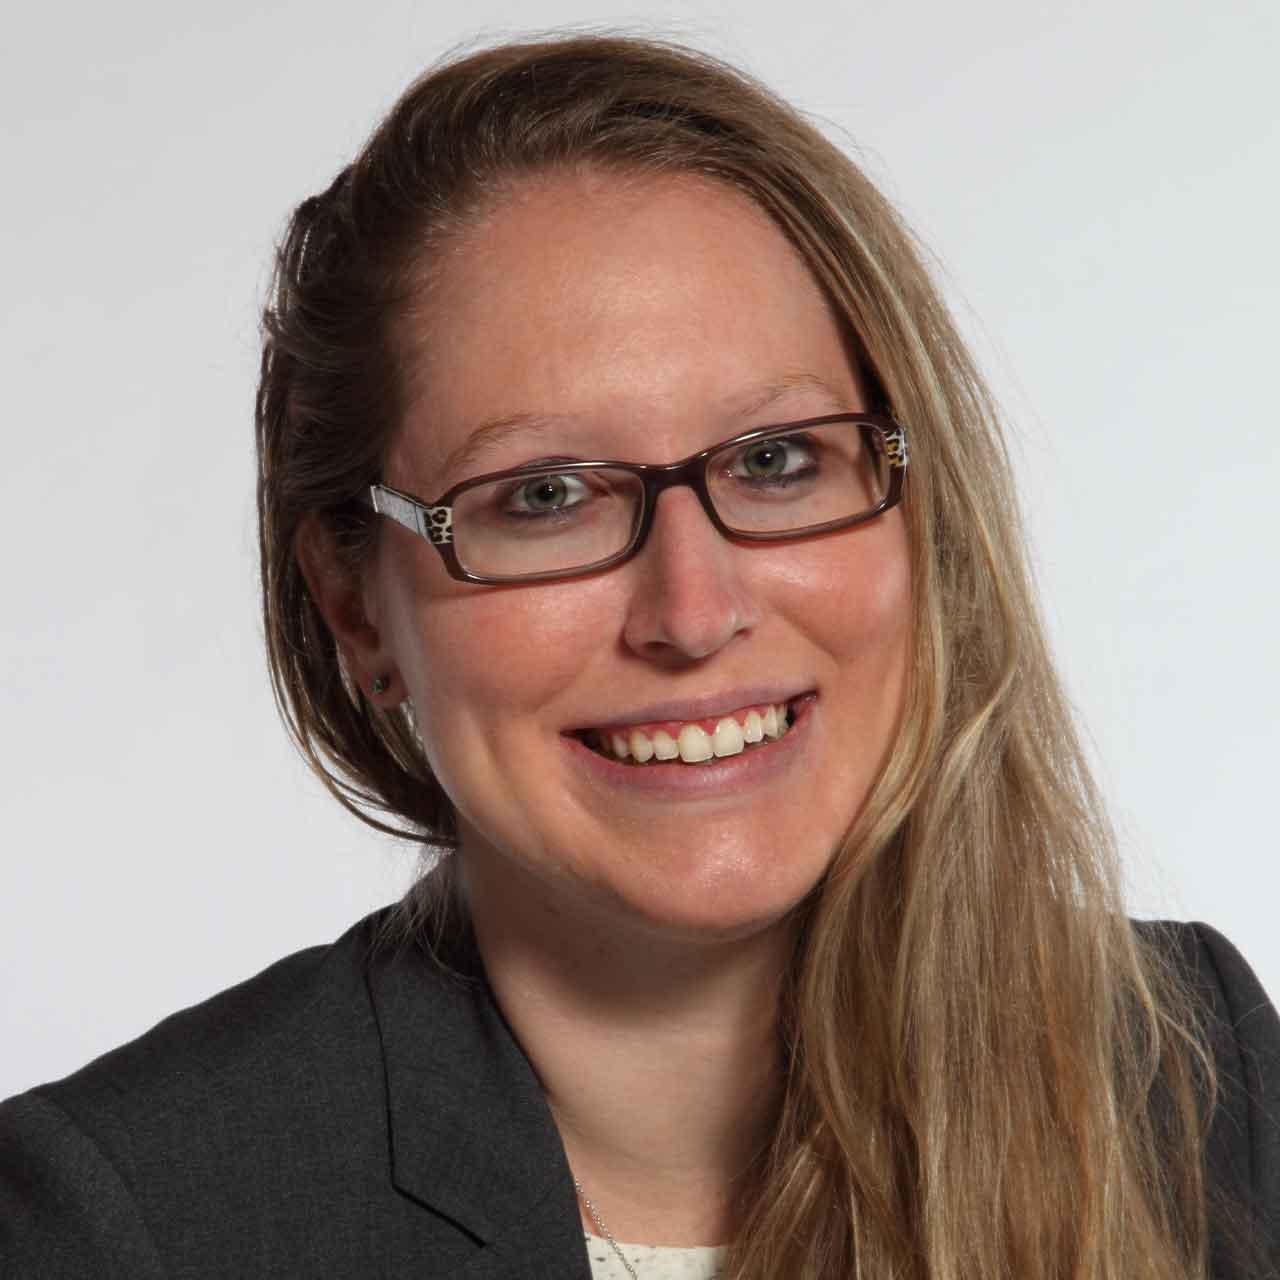 Lindsey Epling